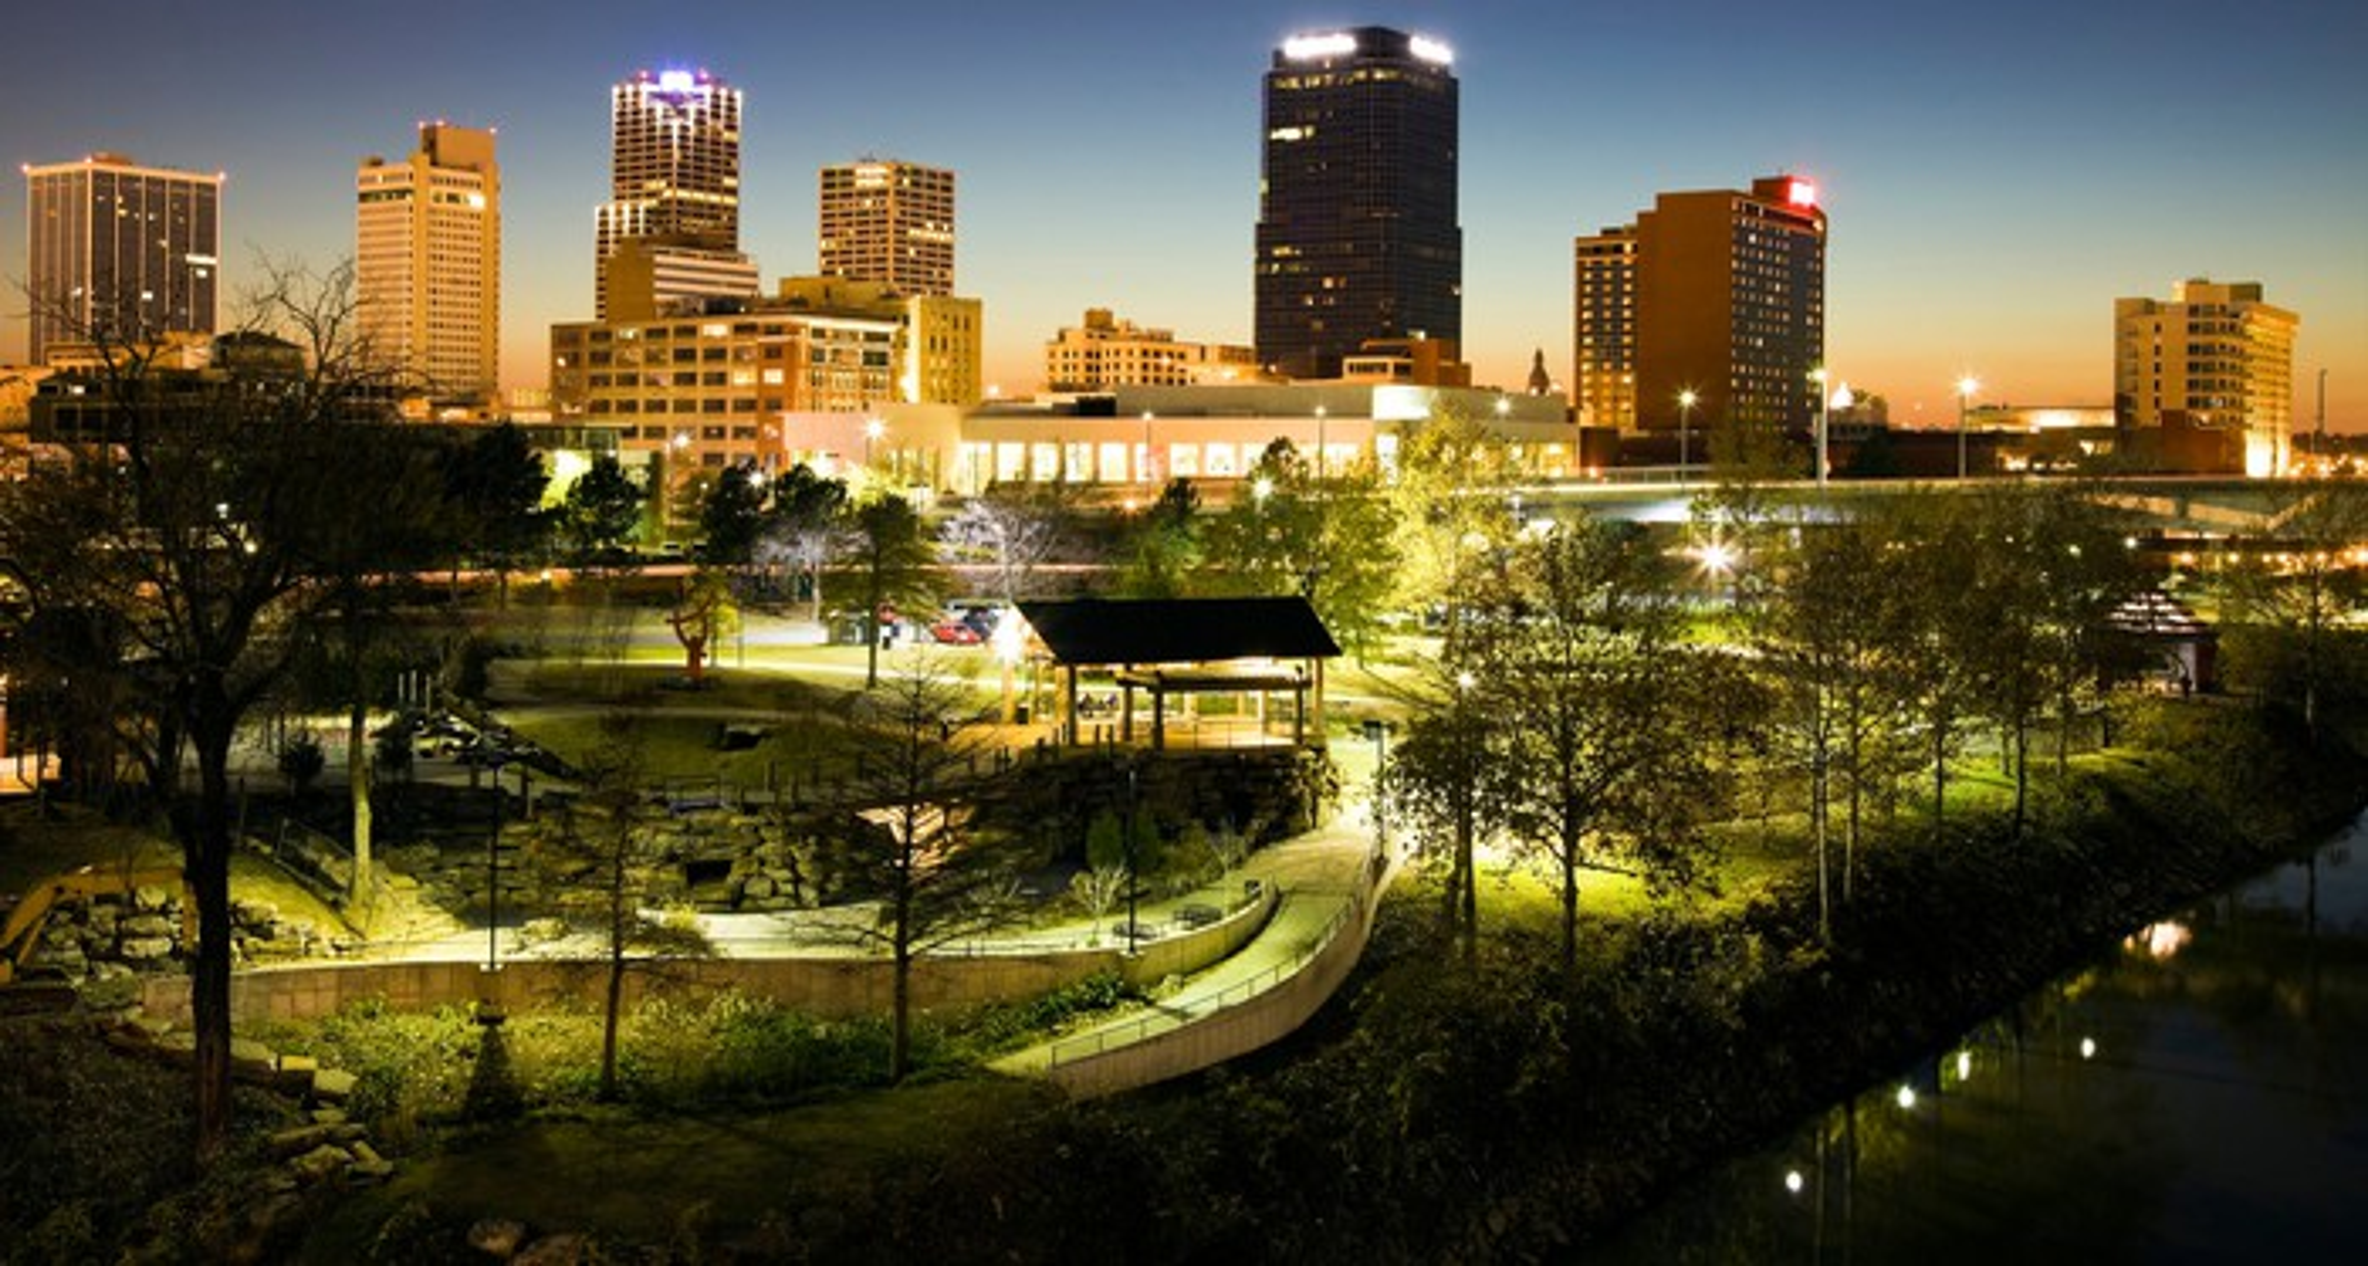 Downtown Little Rock, Arkansas at night.